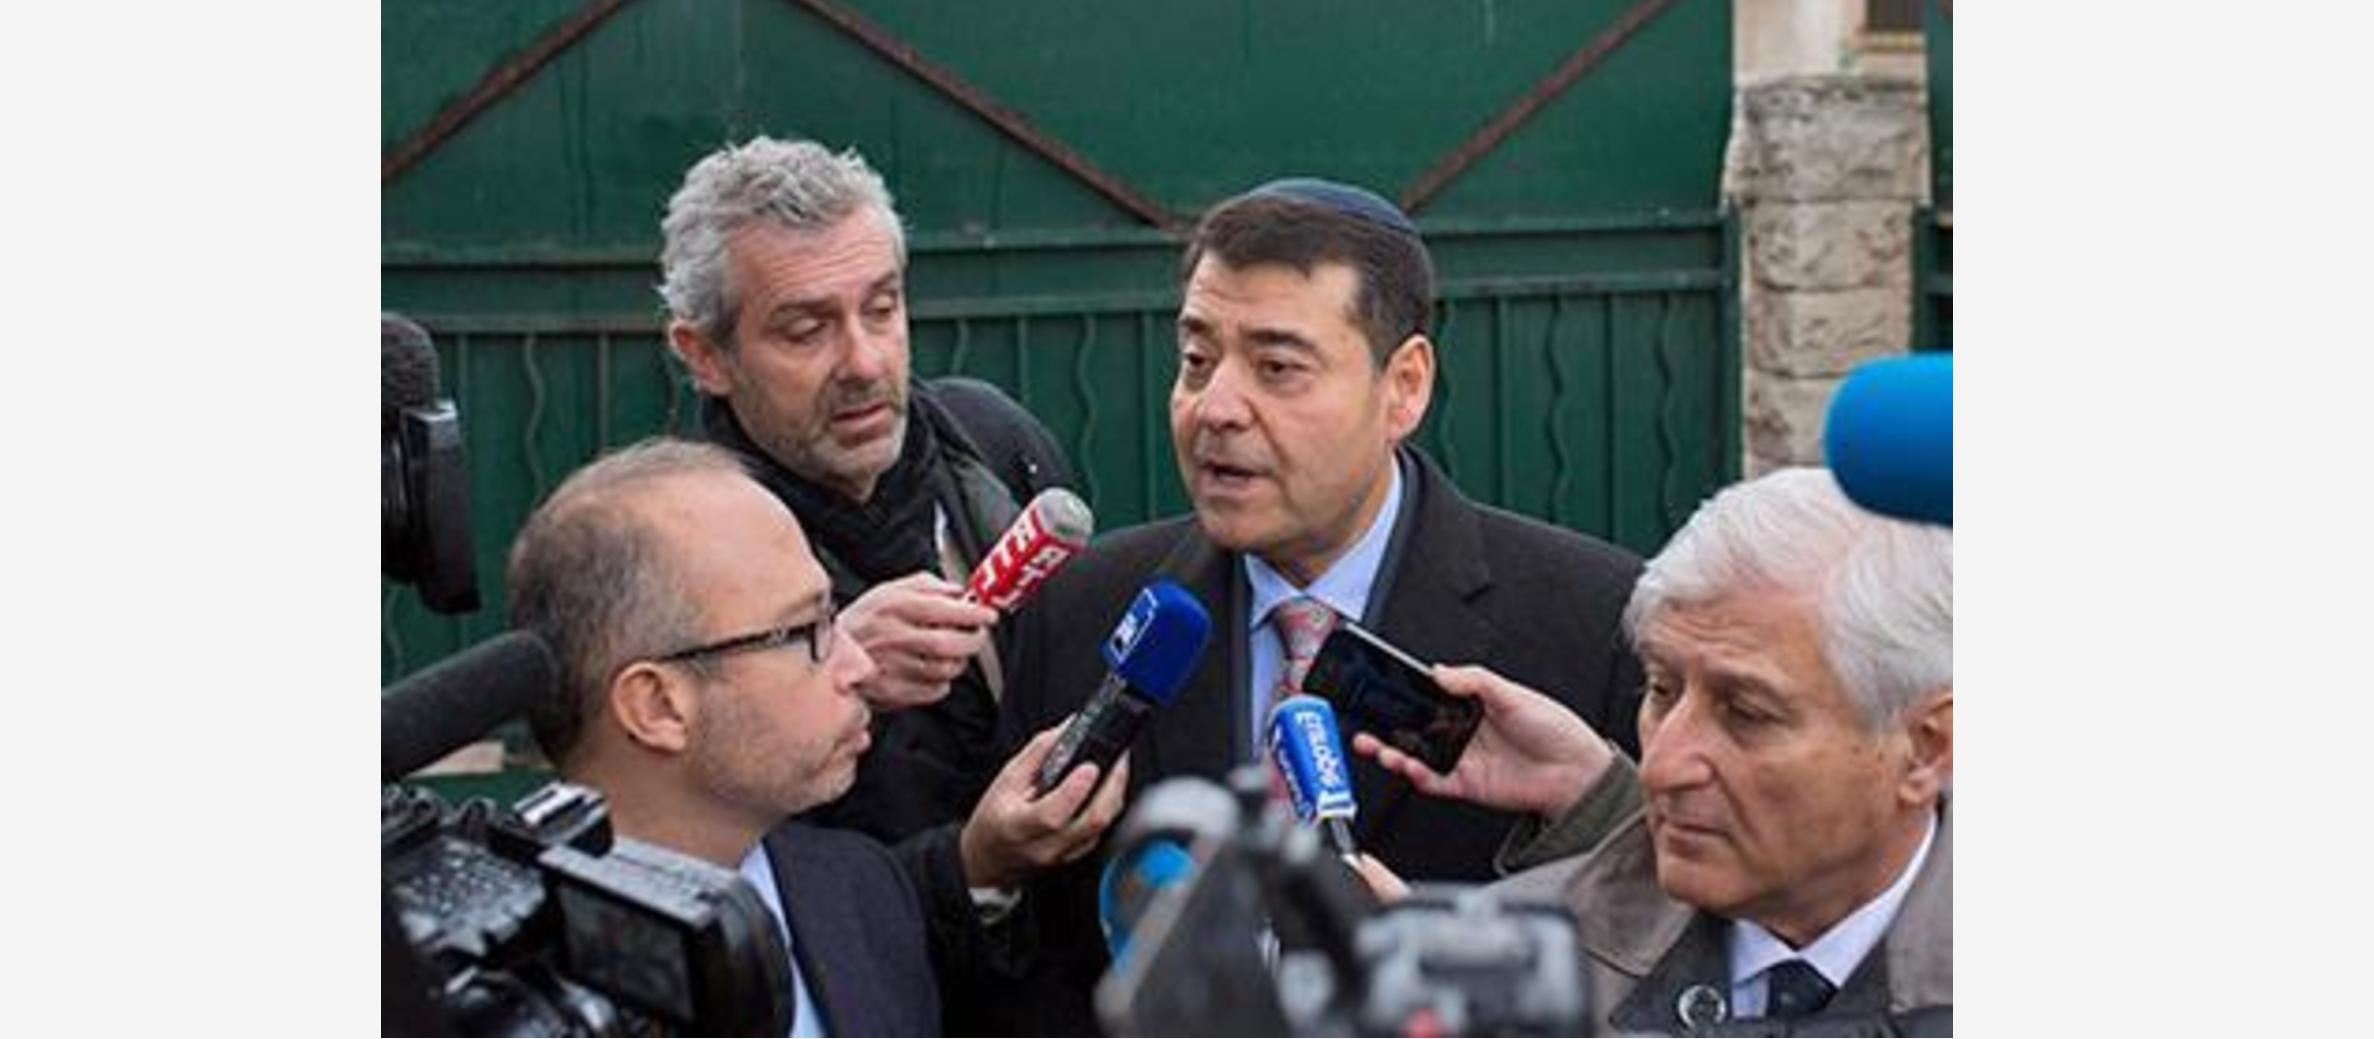 Head of Marseille Jews urges them not to wear kippa after attack